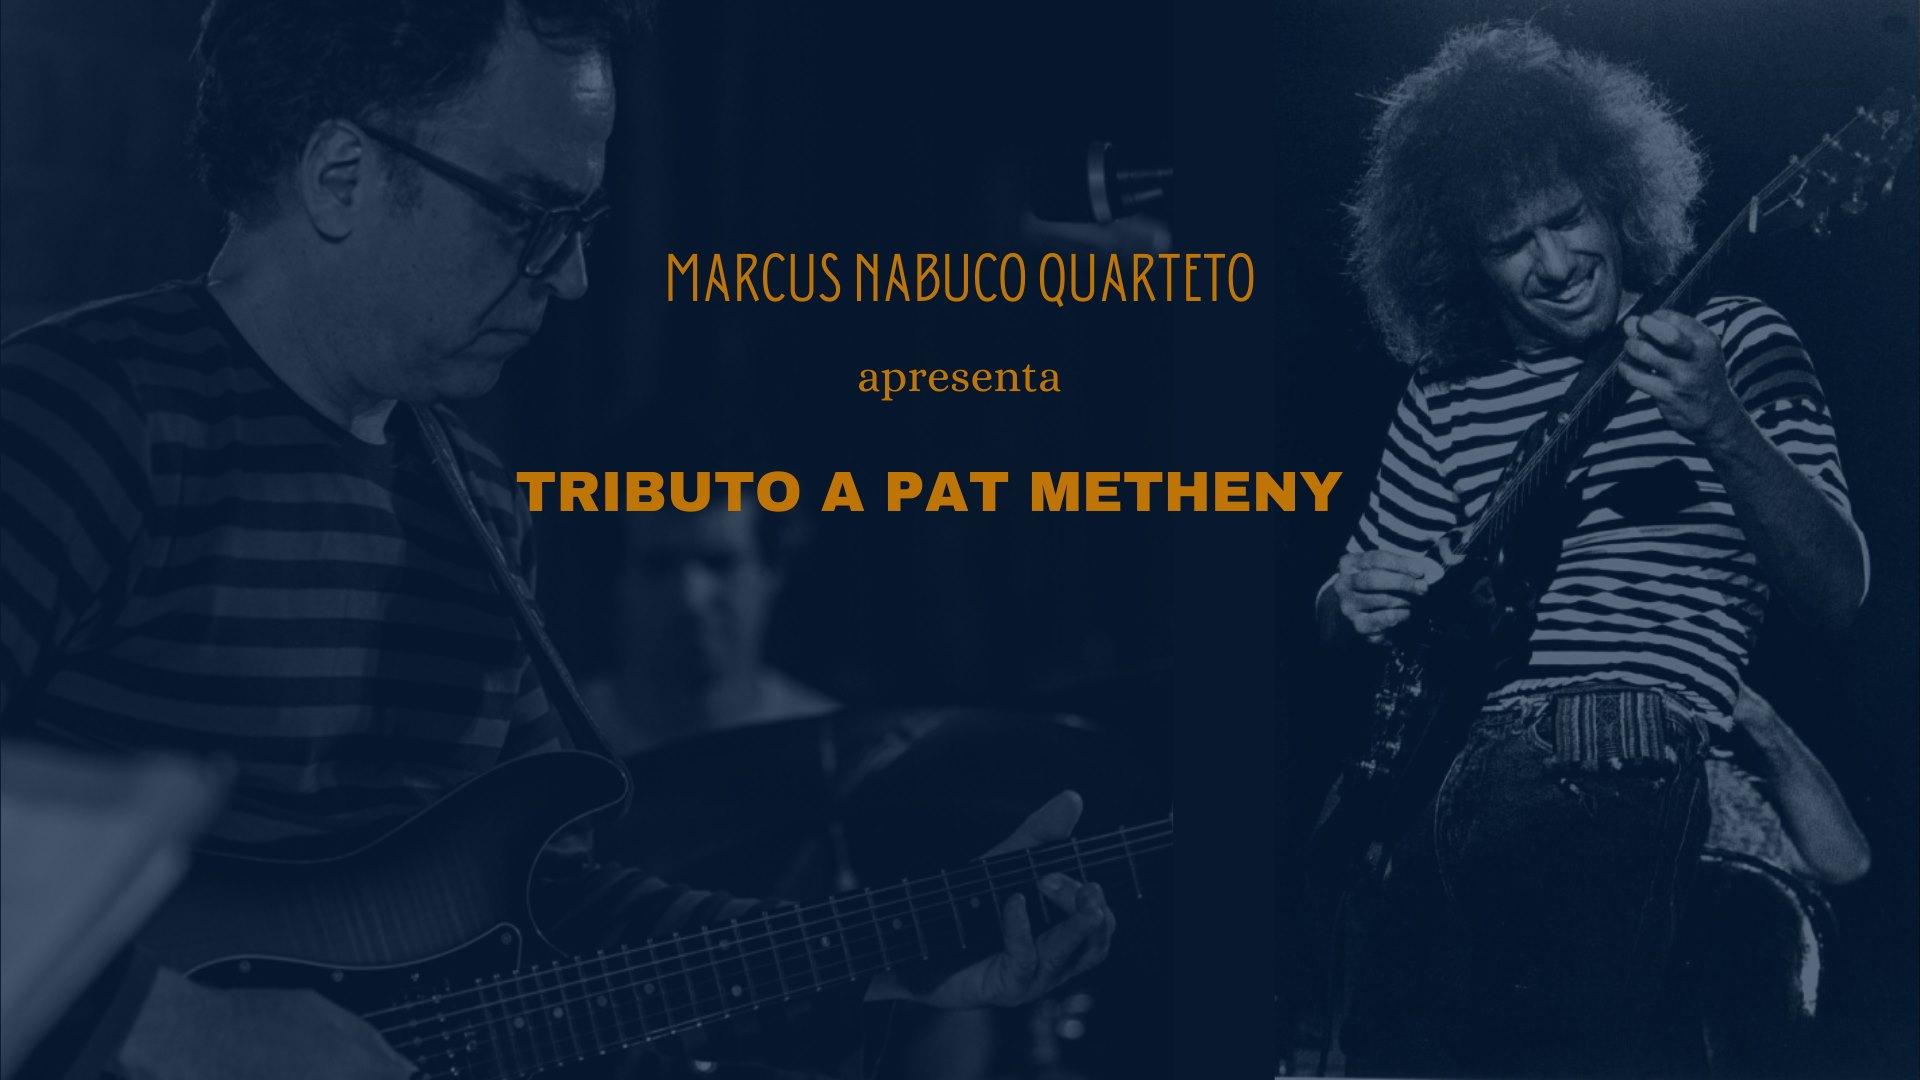 Marcus Nabuco Quarteto - Tributo a Pat Metheny